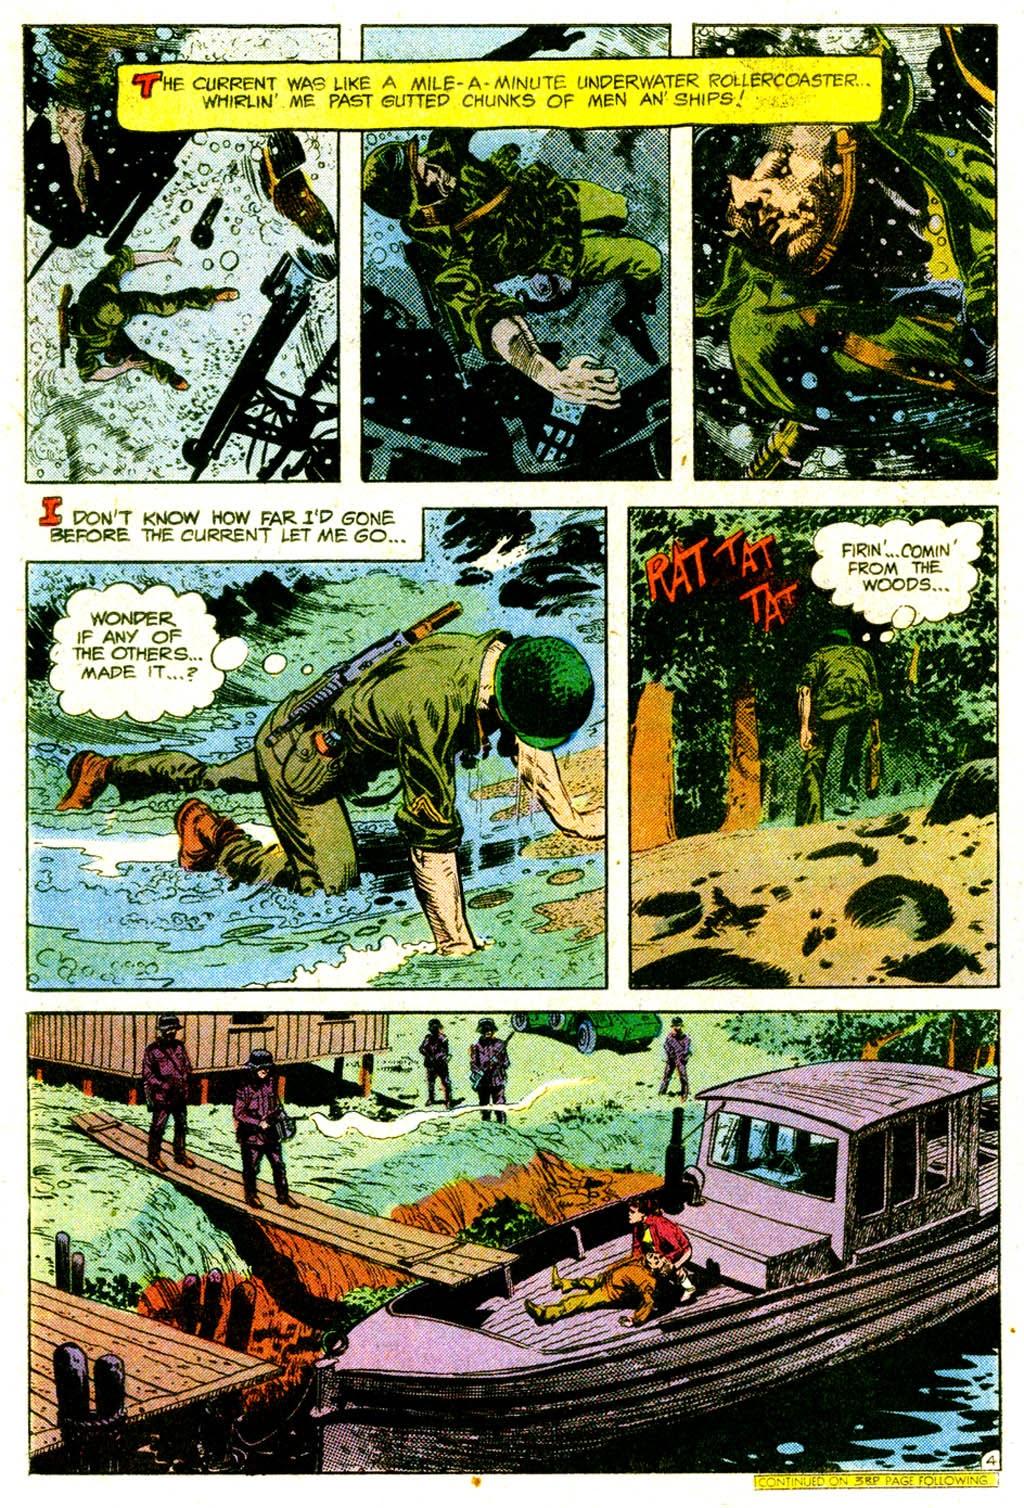 Read online Sgt. Rock comic -  Issue #311 - 5